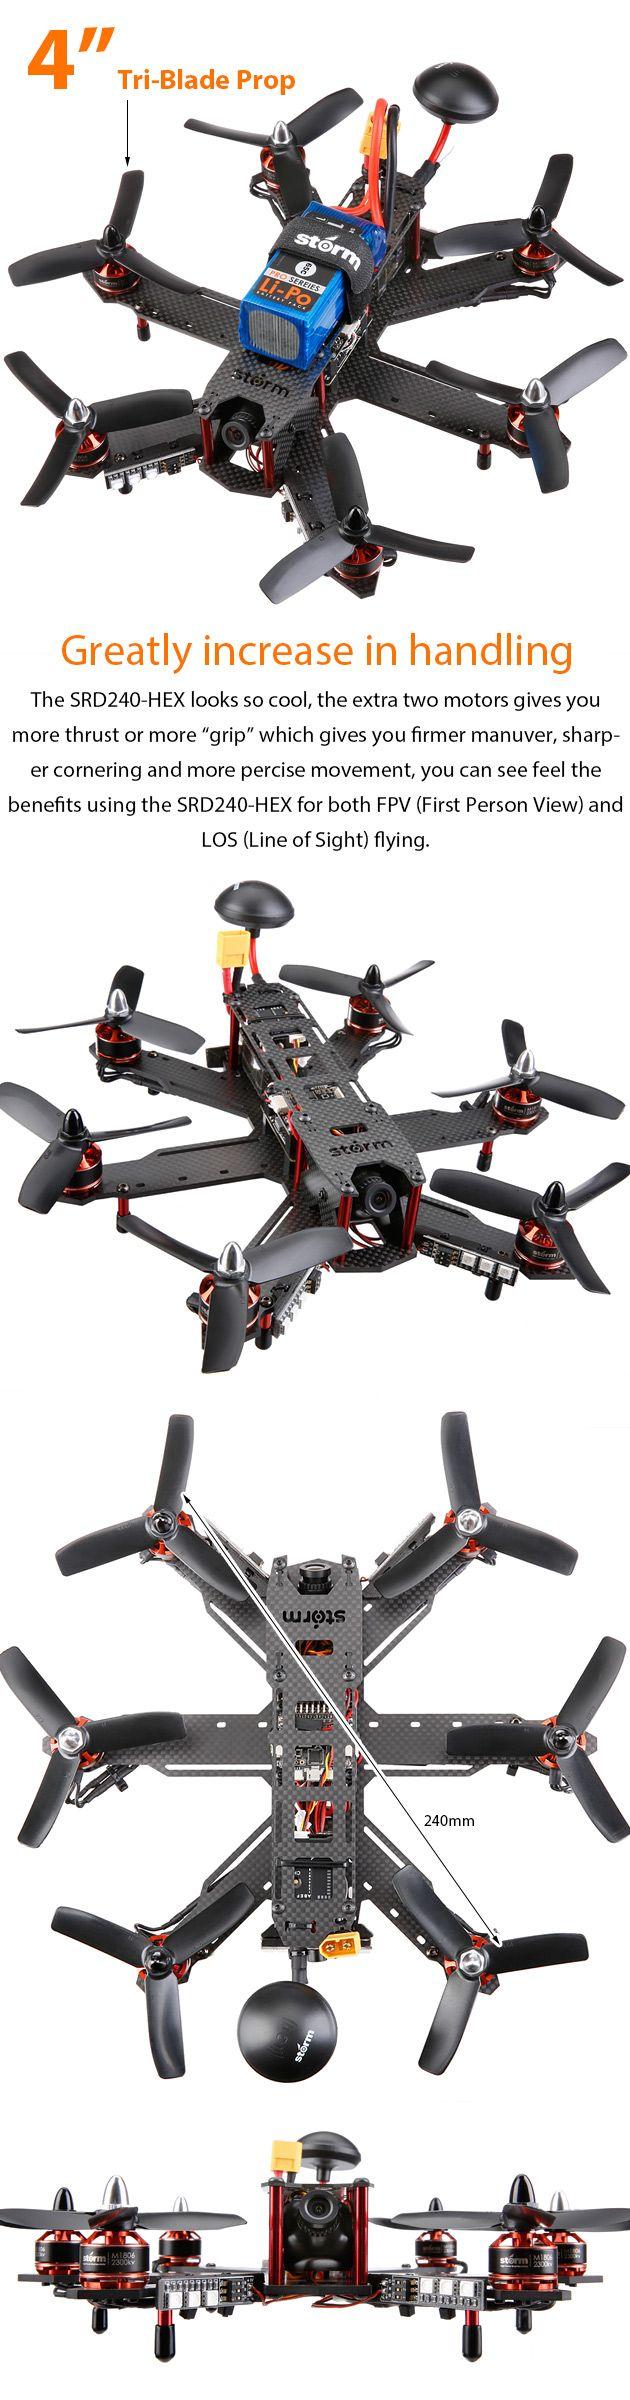 Storm Racing Drone (RTF / SRD240-HEX / CleanFlight) www.helipal.com/...